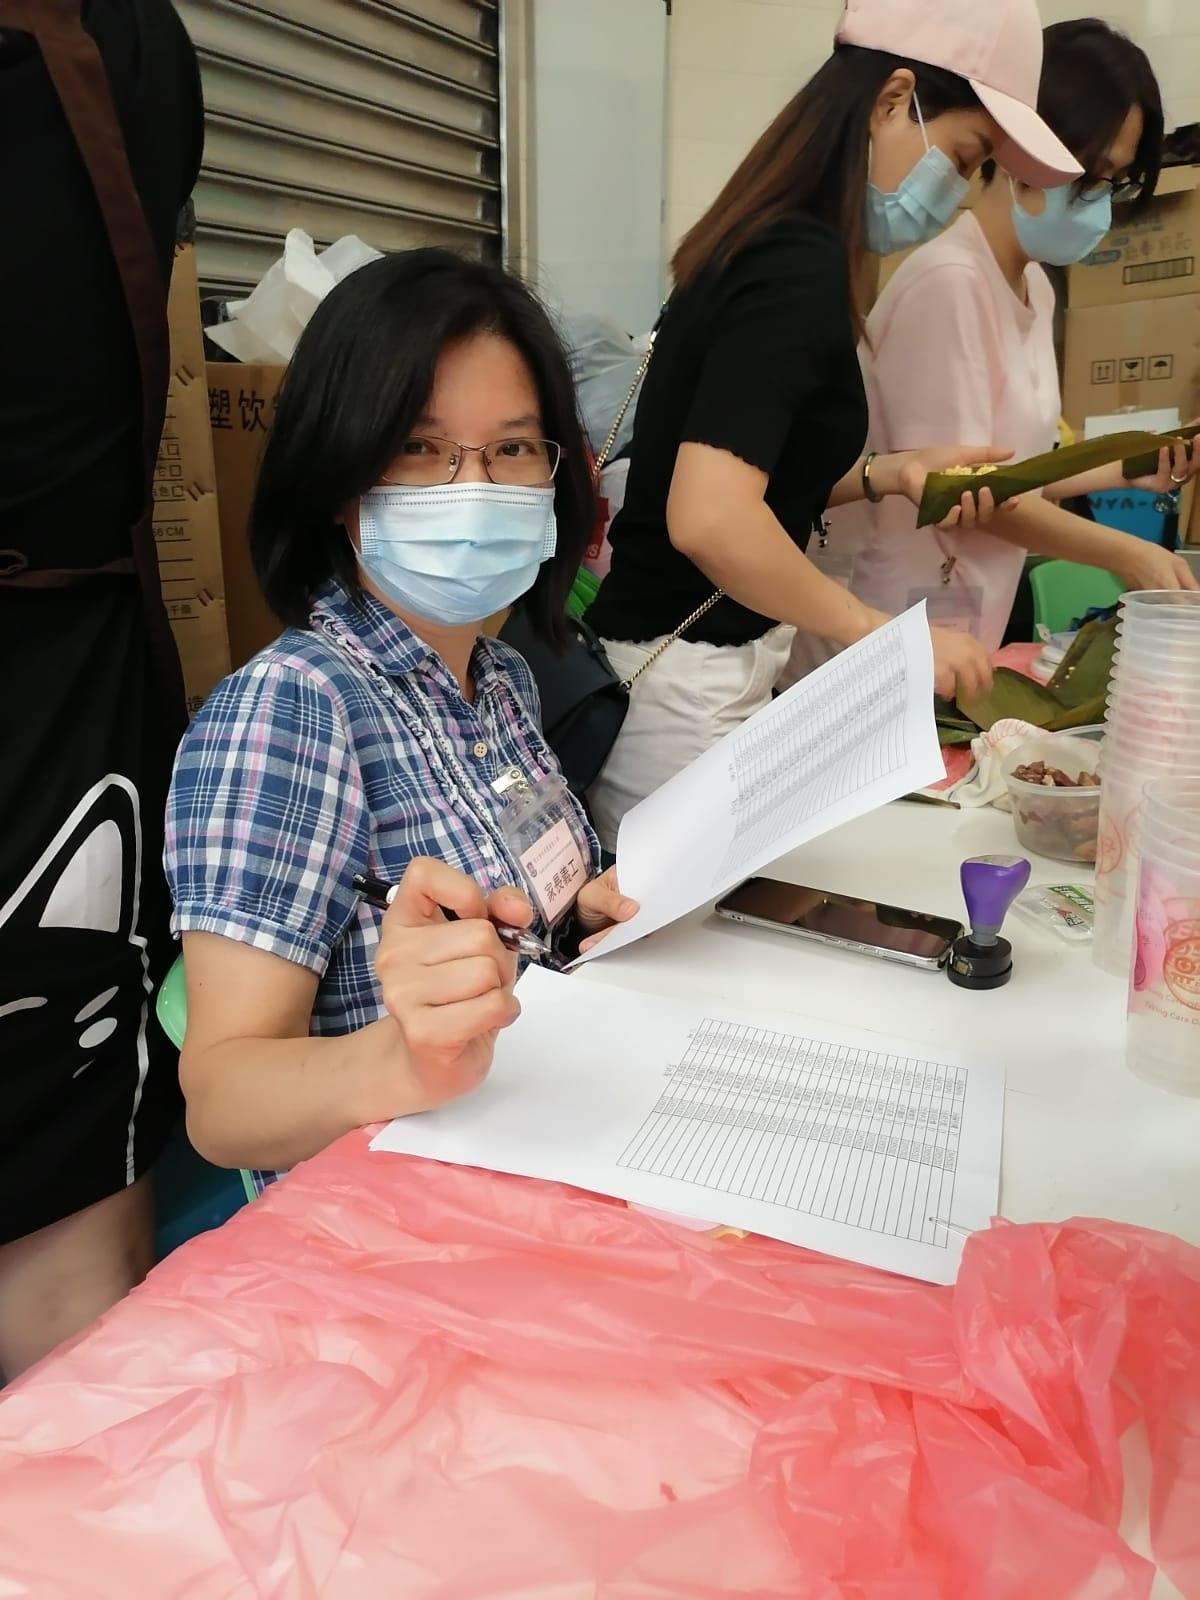 https://skhtswlo.edu.hk/sites/default/files/whatsapp_image_2021-06-02_at_10.21.10.jpeg